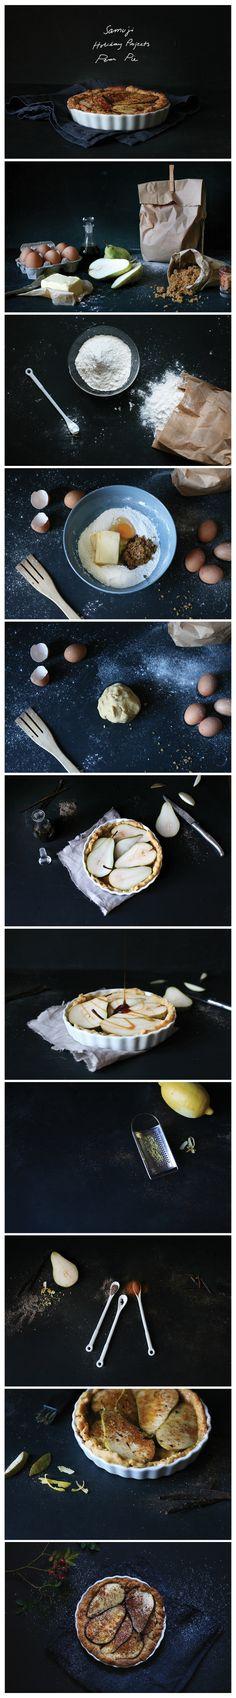 Samuji Holiday Projects: Pear Pie